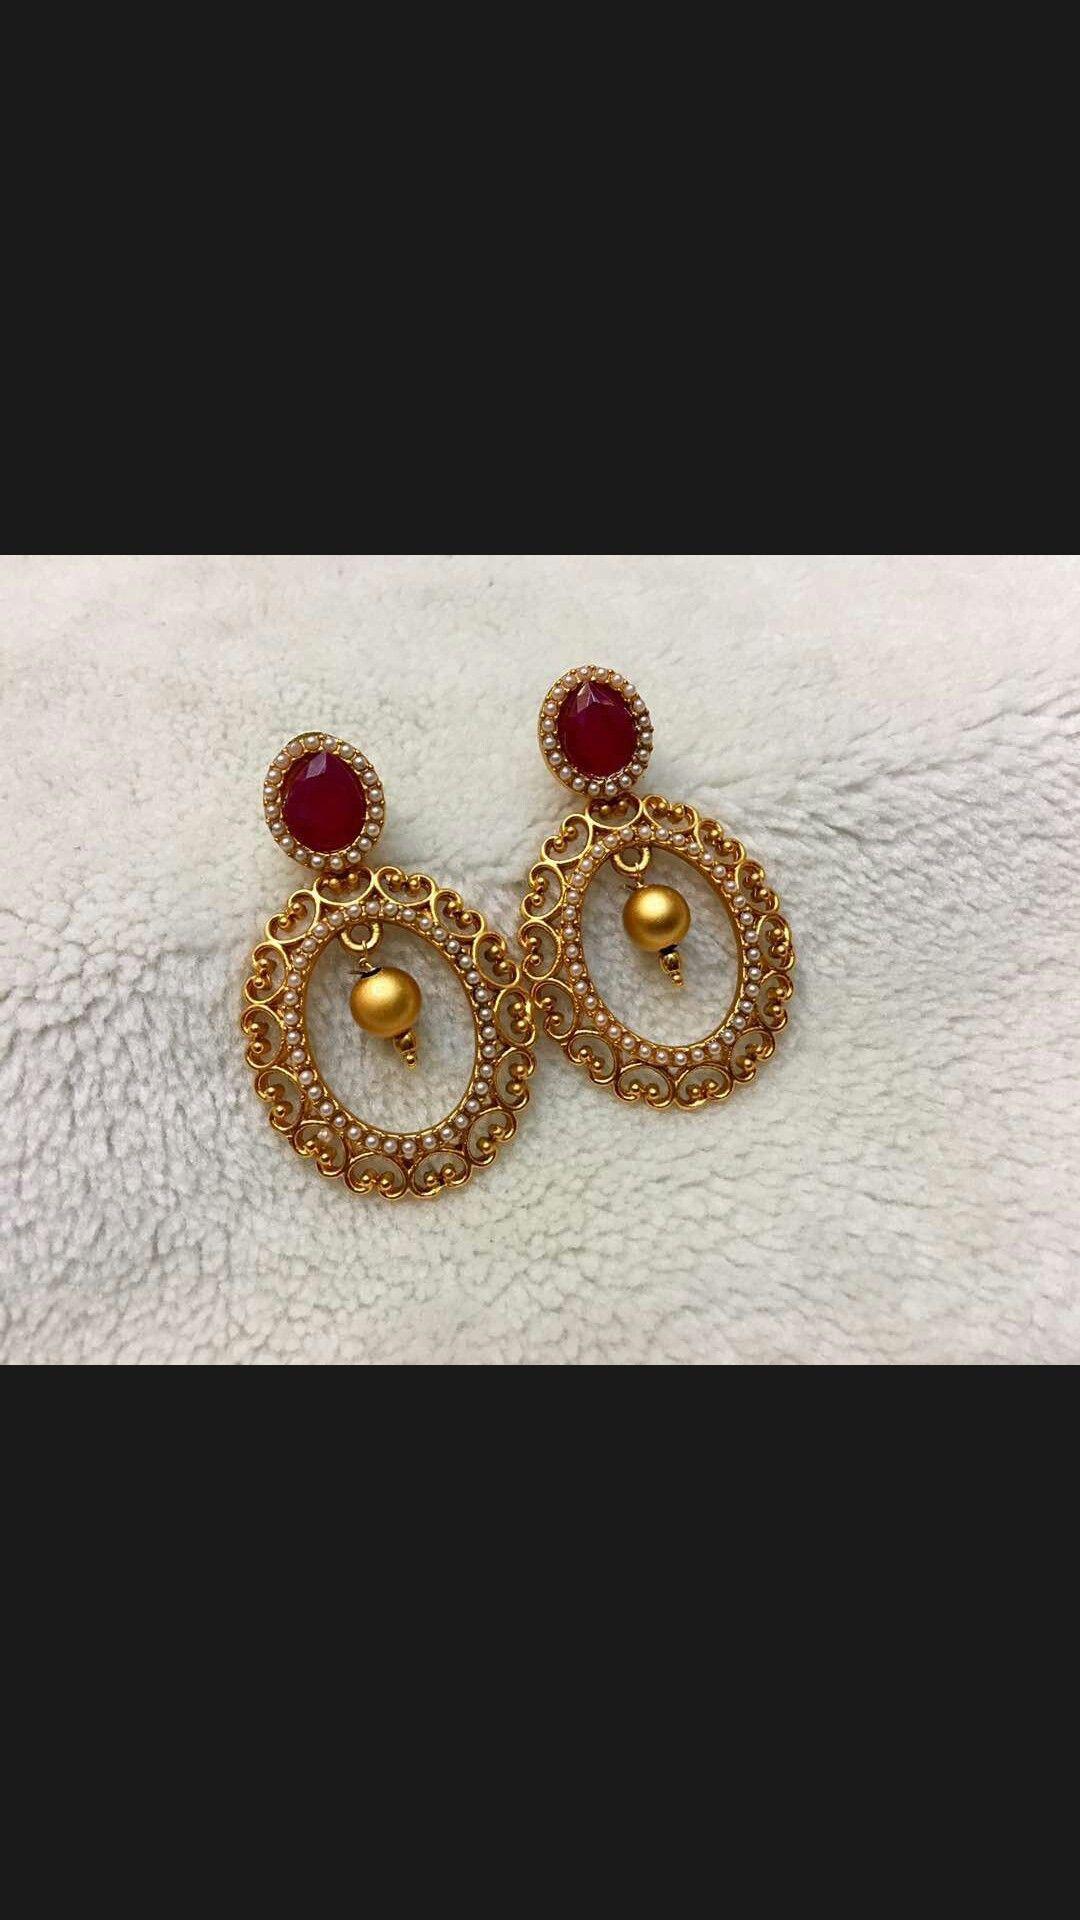 Pintrestdixna deol veera pinterest ear rings india jewelry